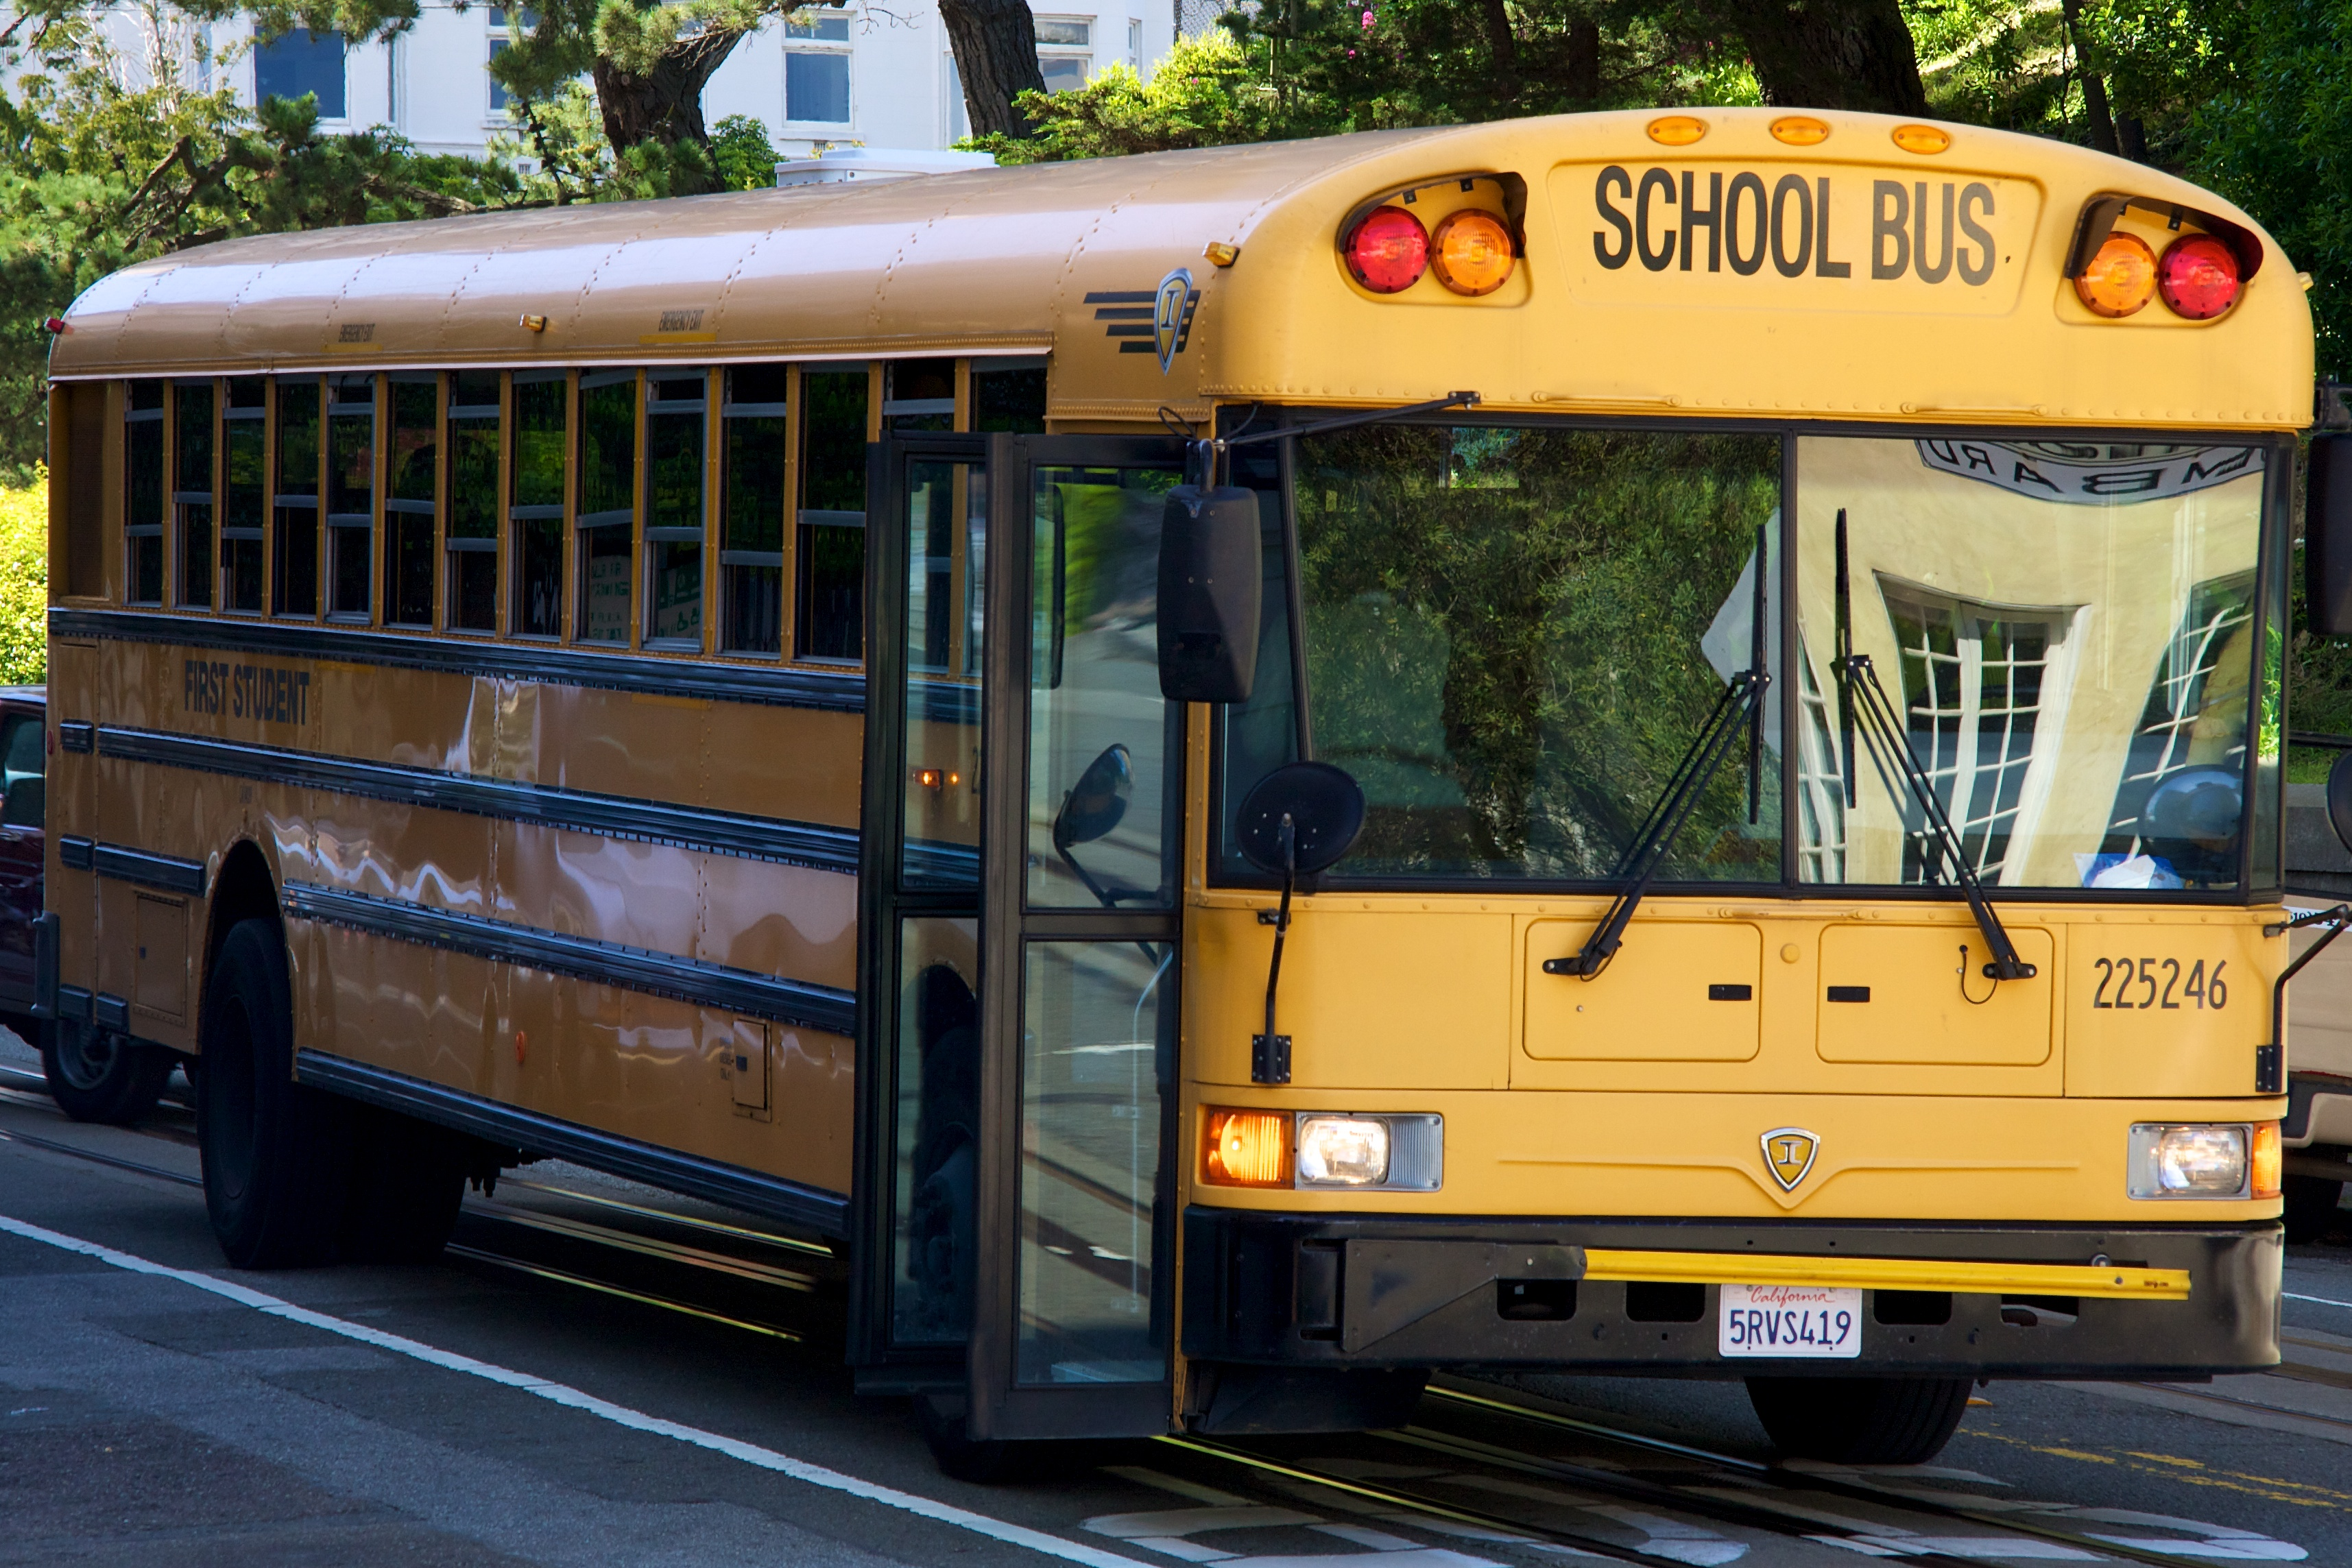 File ICRE School bus Wikimedia mons